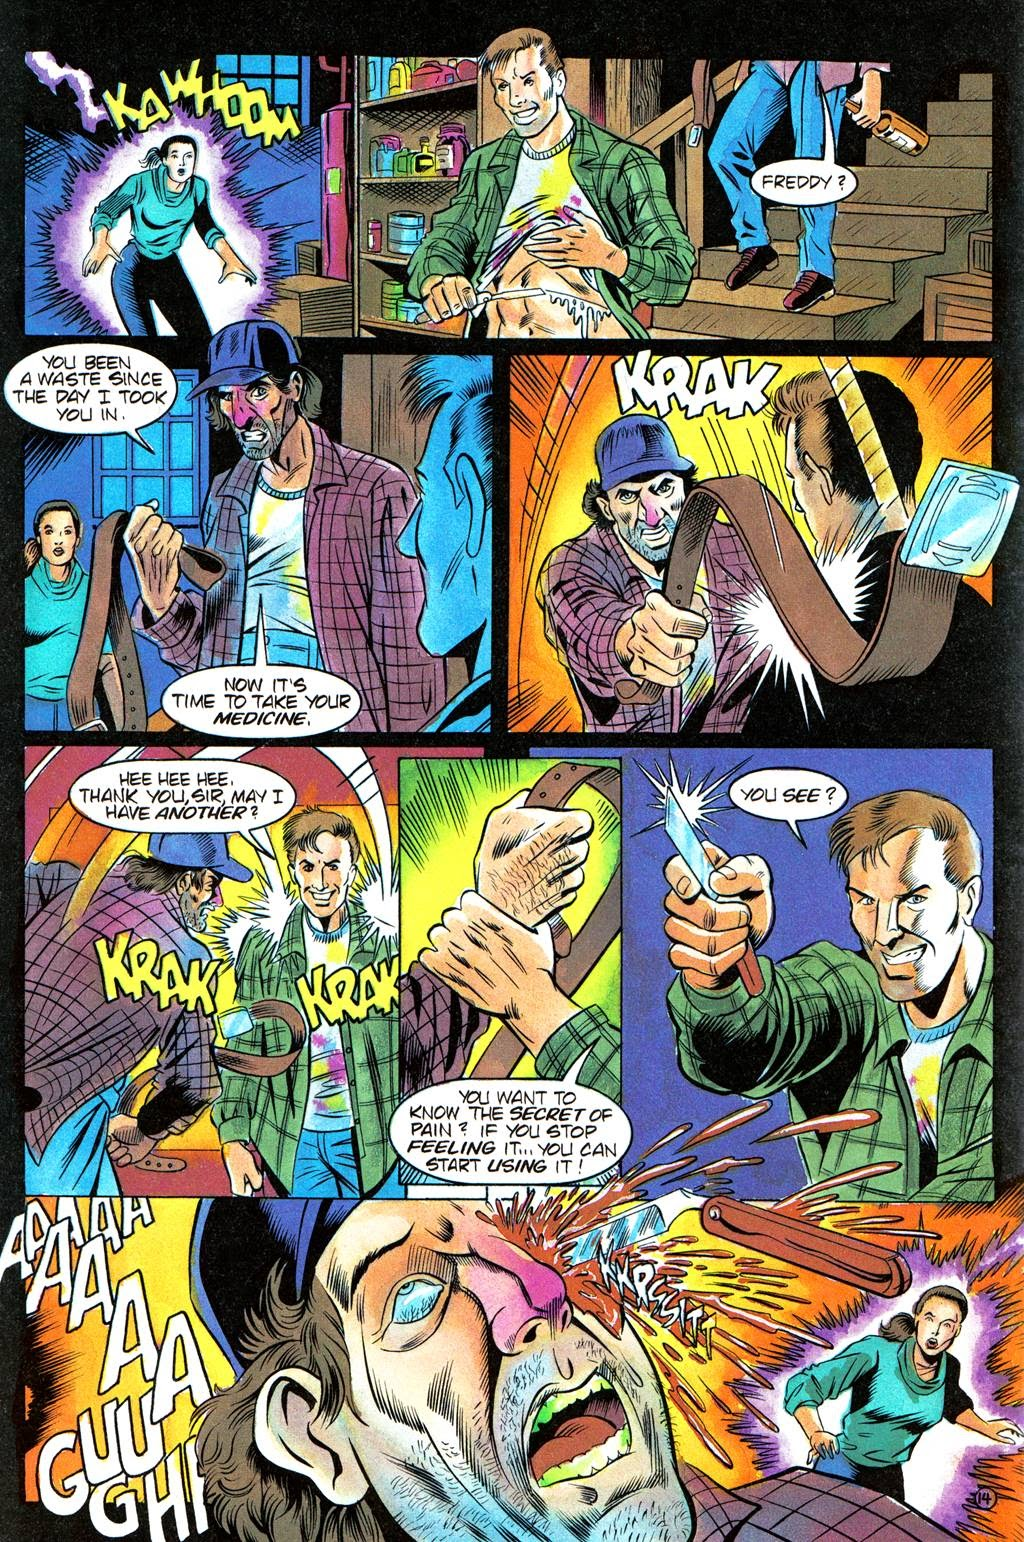 Read online Freddy's Dead: The Final Nightmare comic -  Issue #3 - 17